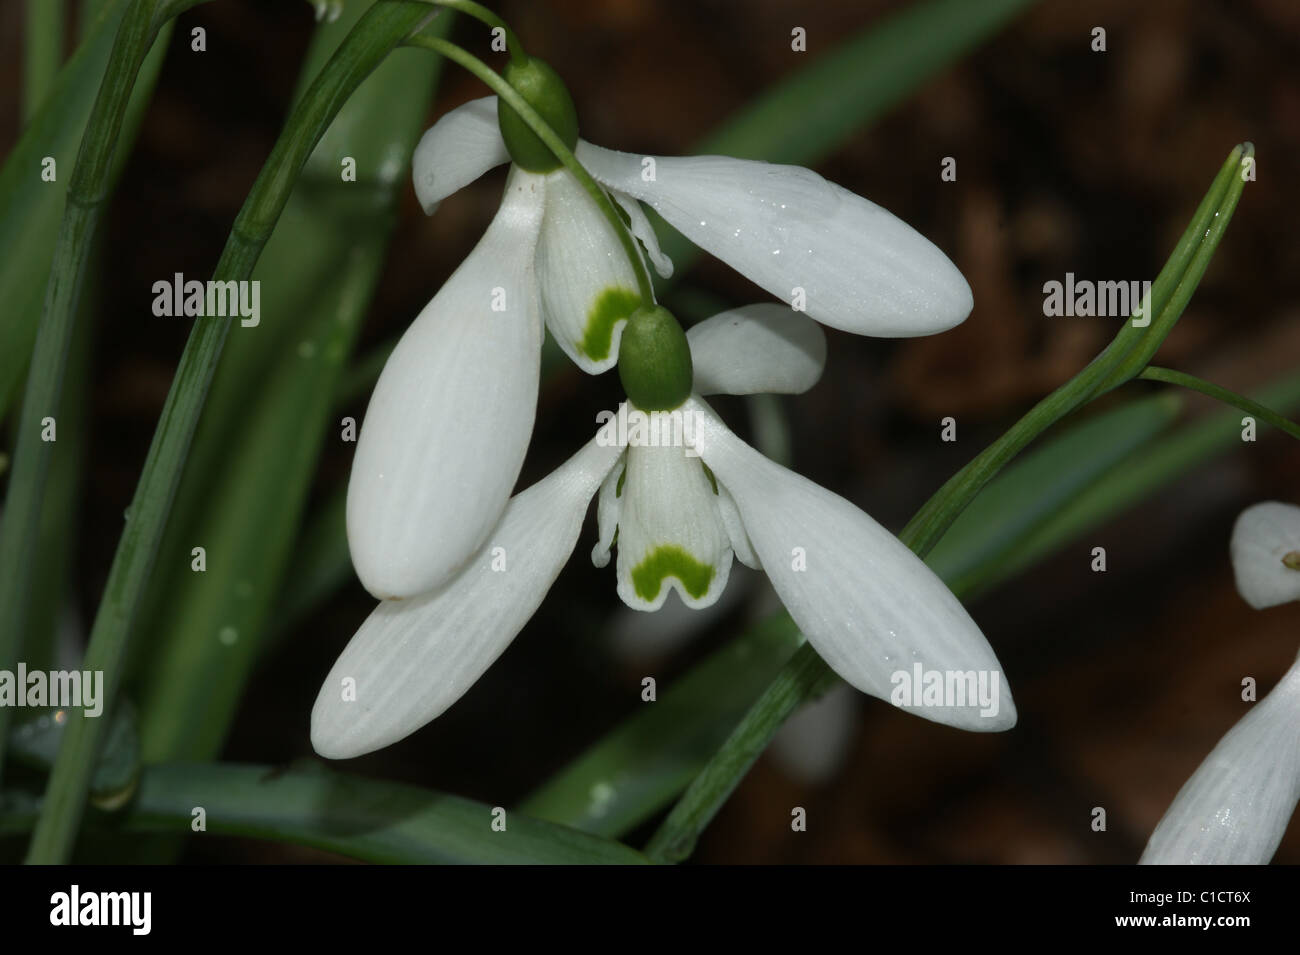 Galanthus 'Magnet' Photo Stock